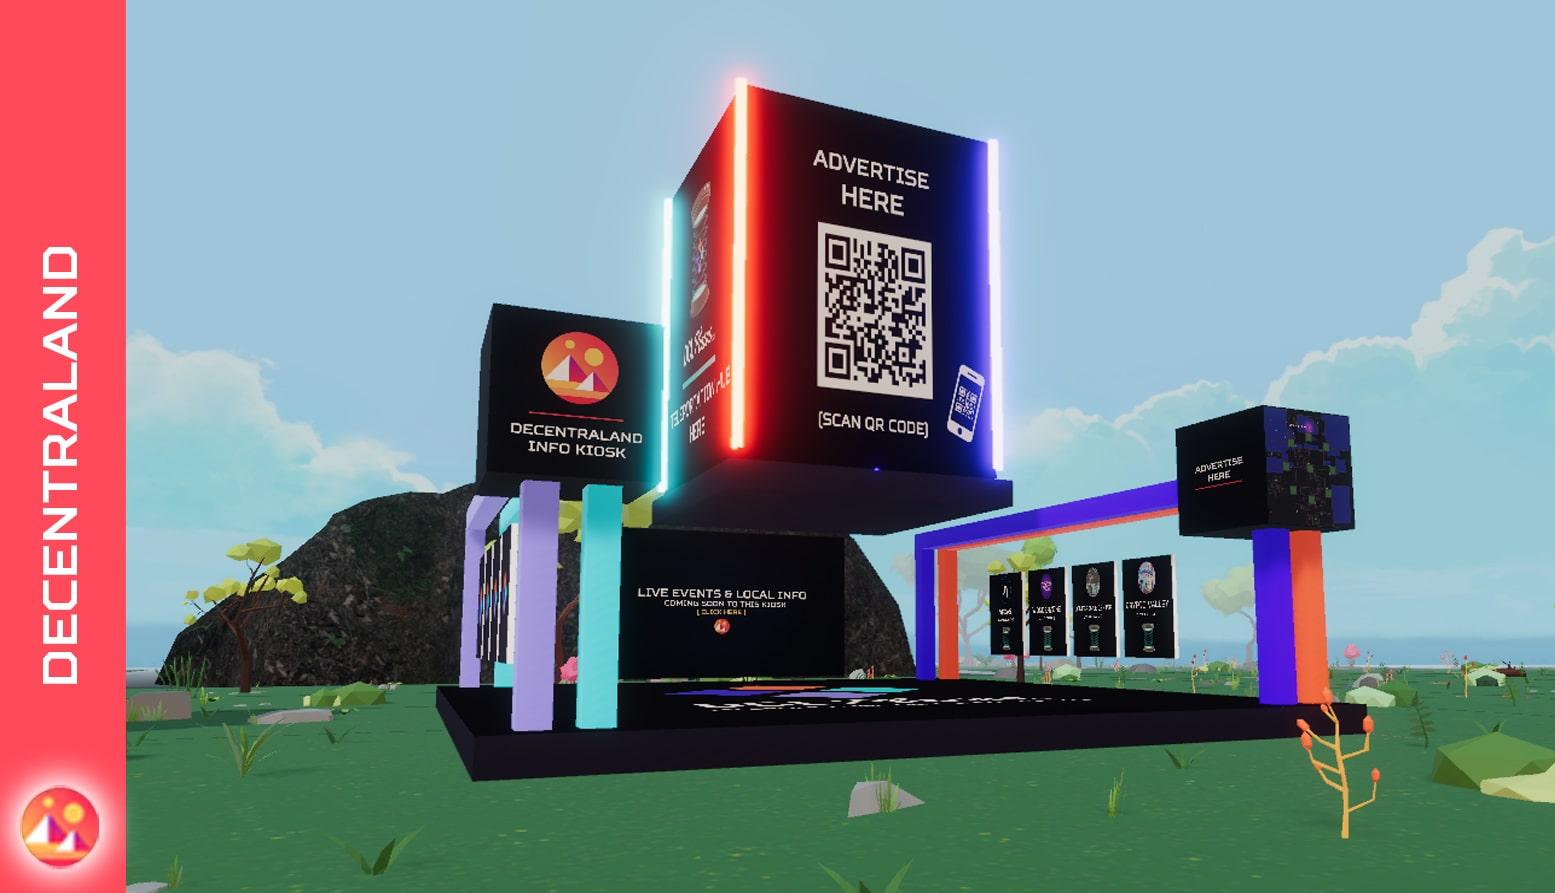 DCLplazas kiosk decentraland model